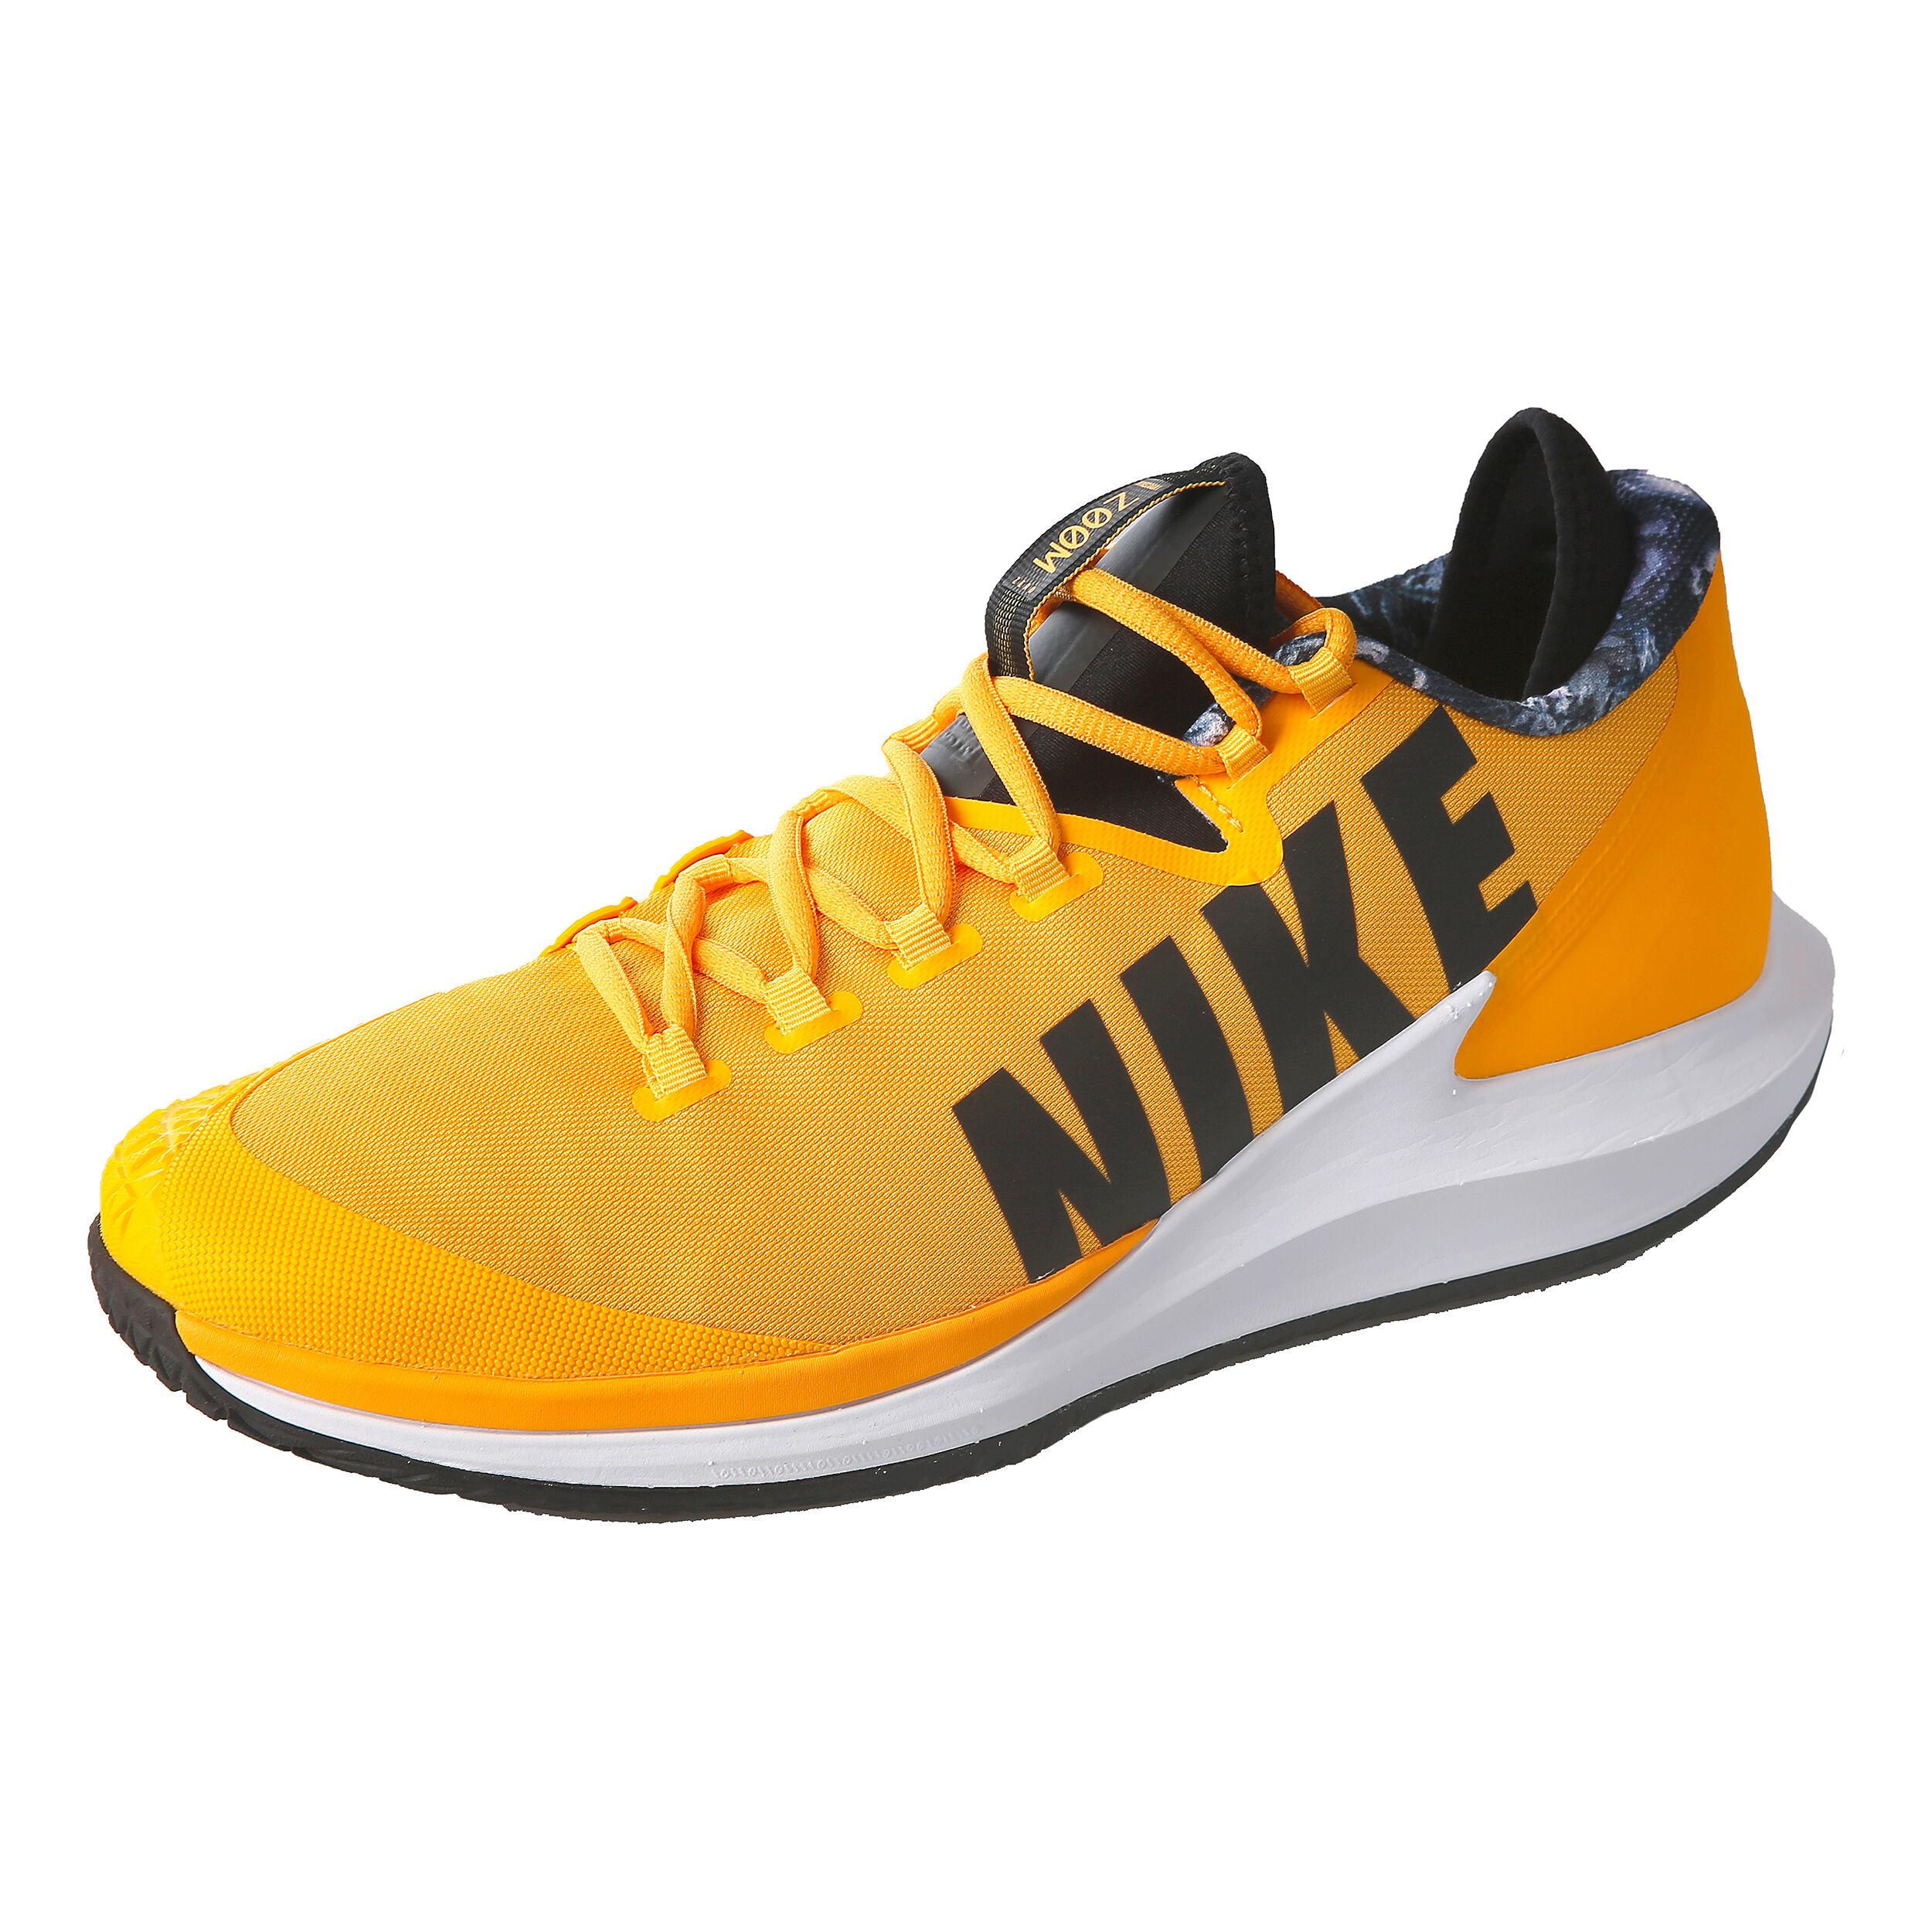 Nike Air Zoom Zero Chaussures Toutes Surfaces Hommes Jaune